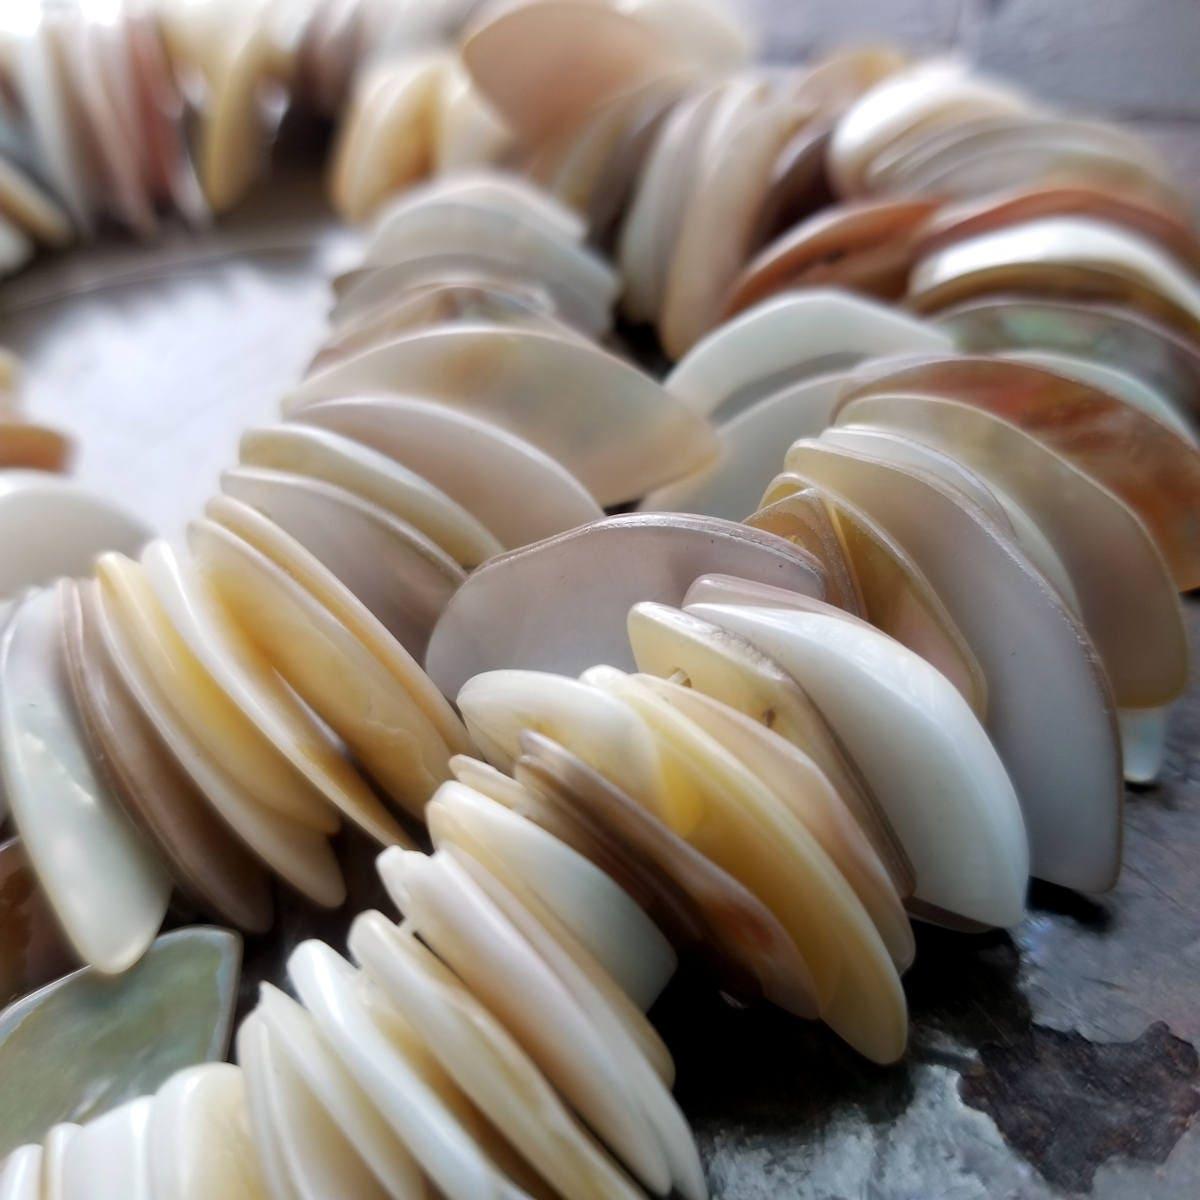 shell perles perles de nacre coquillage naturel marquise. Black Bedroom Furniture Sets. Home Design Ideas